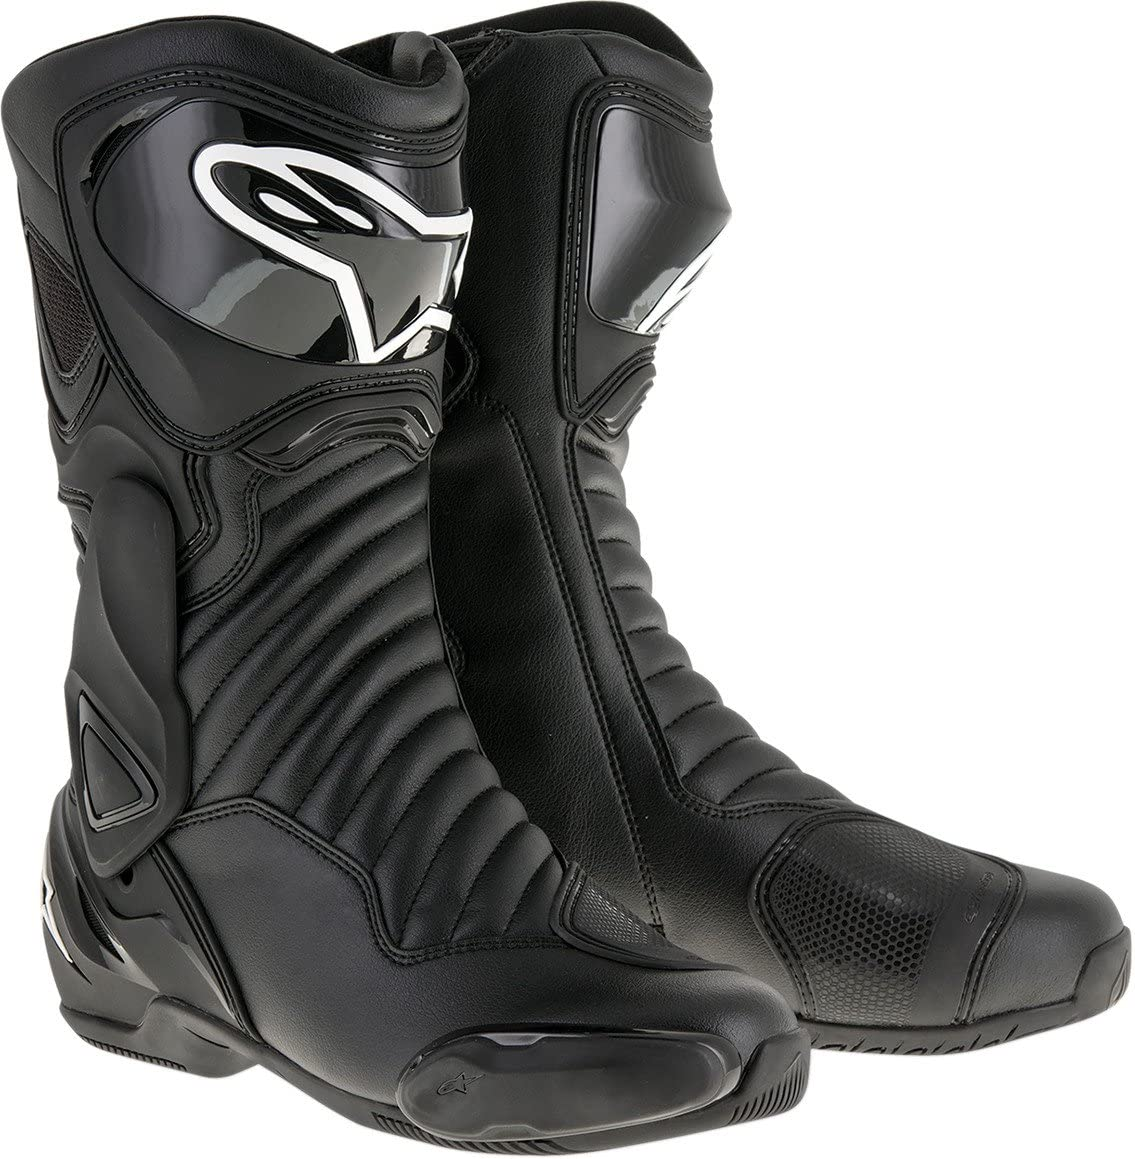 Alpinestars Mens 2223017-1100-46 Boots Black, Size 46